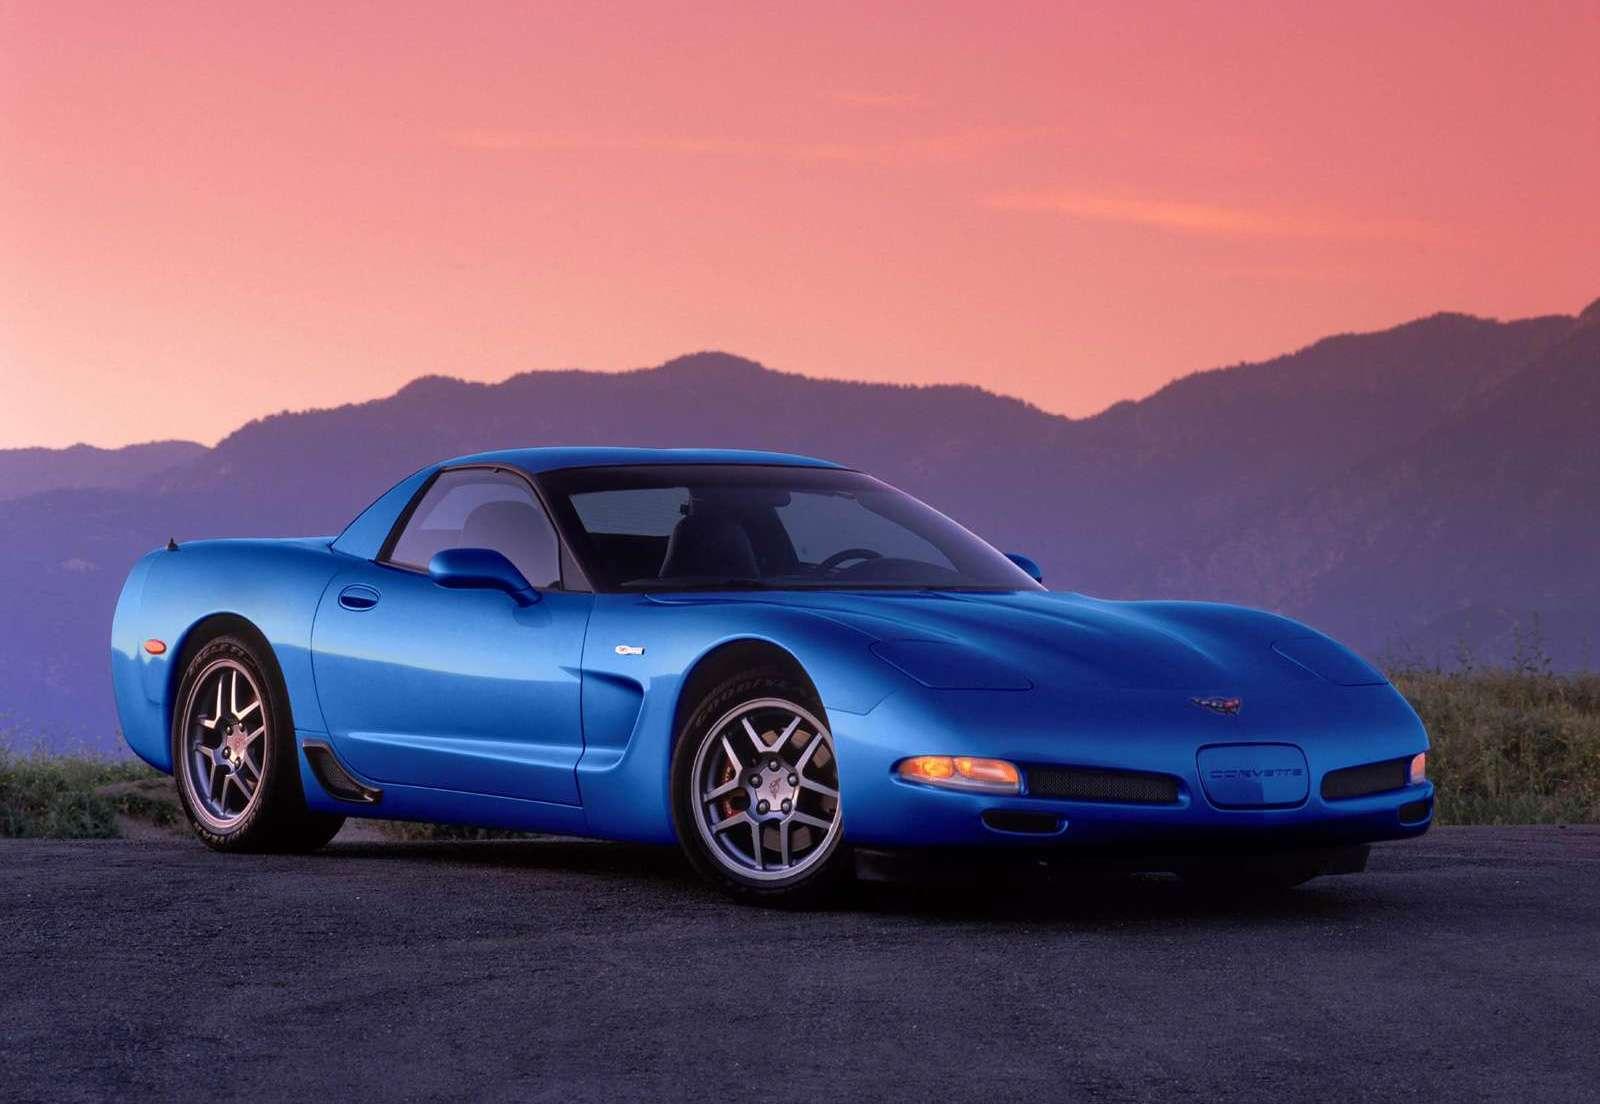 2002 Chevrolet Corvette Z06 front 3/4 blue